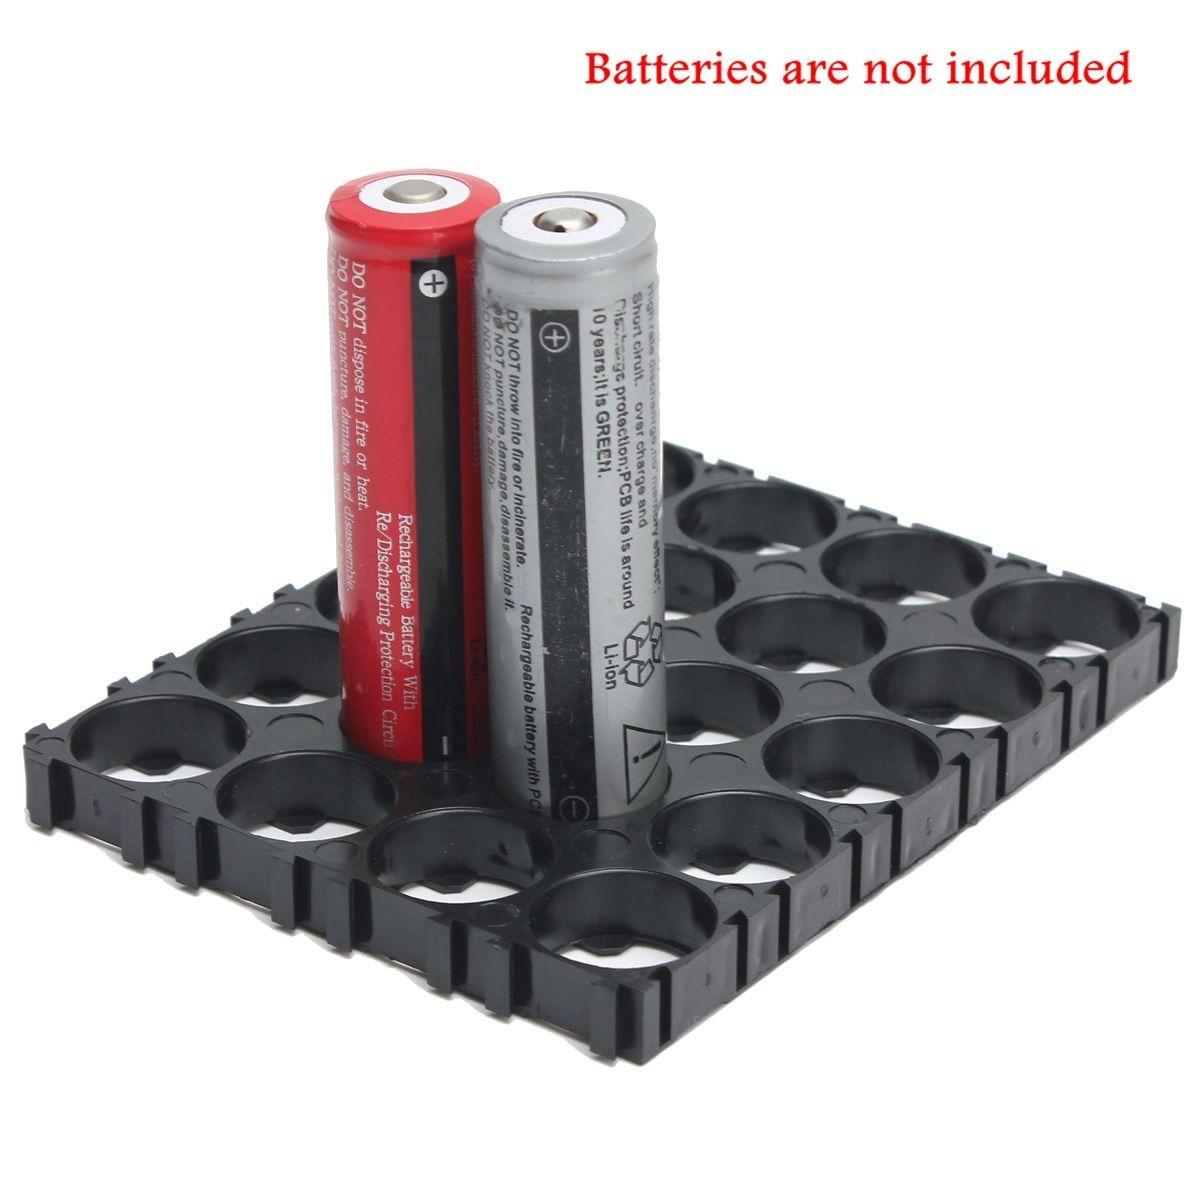 CLAITE 4x5 18650 Battery Storage Case Box Holder Spacer Radiating Shell EV Pack Plastic Holder Bracket